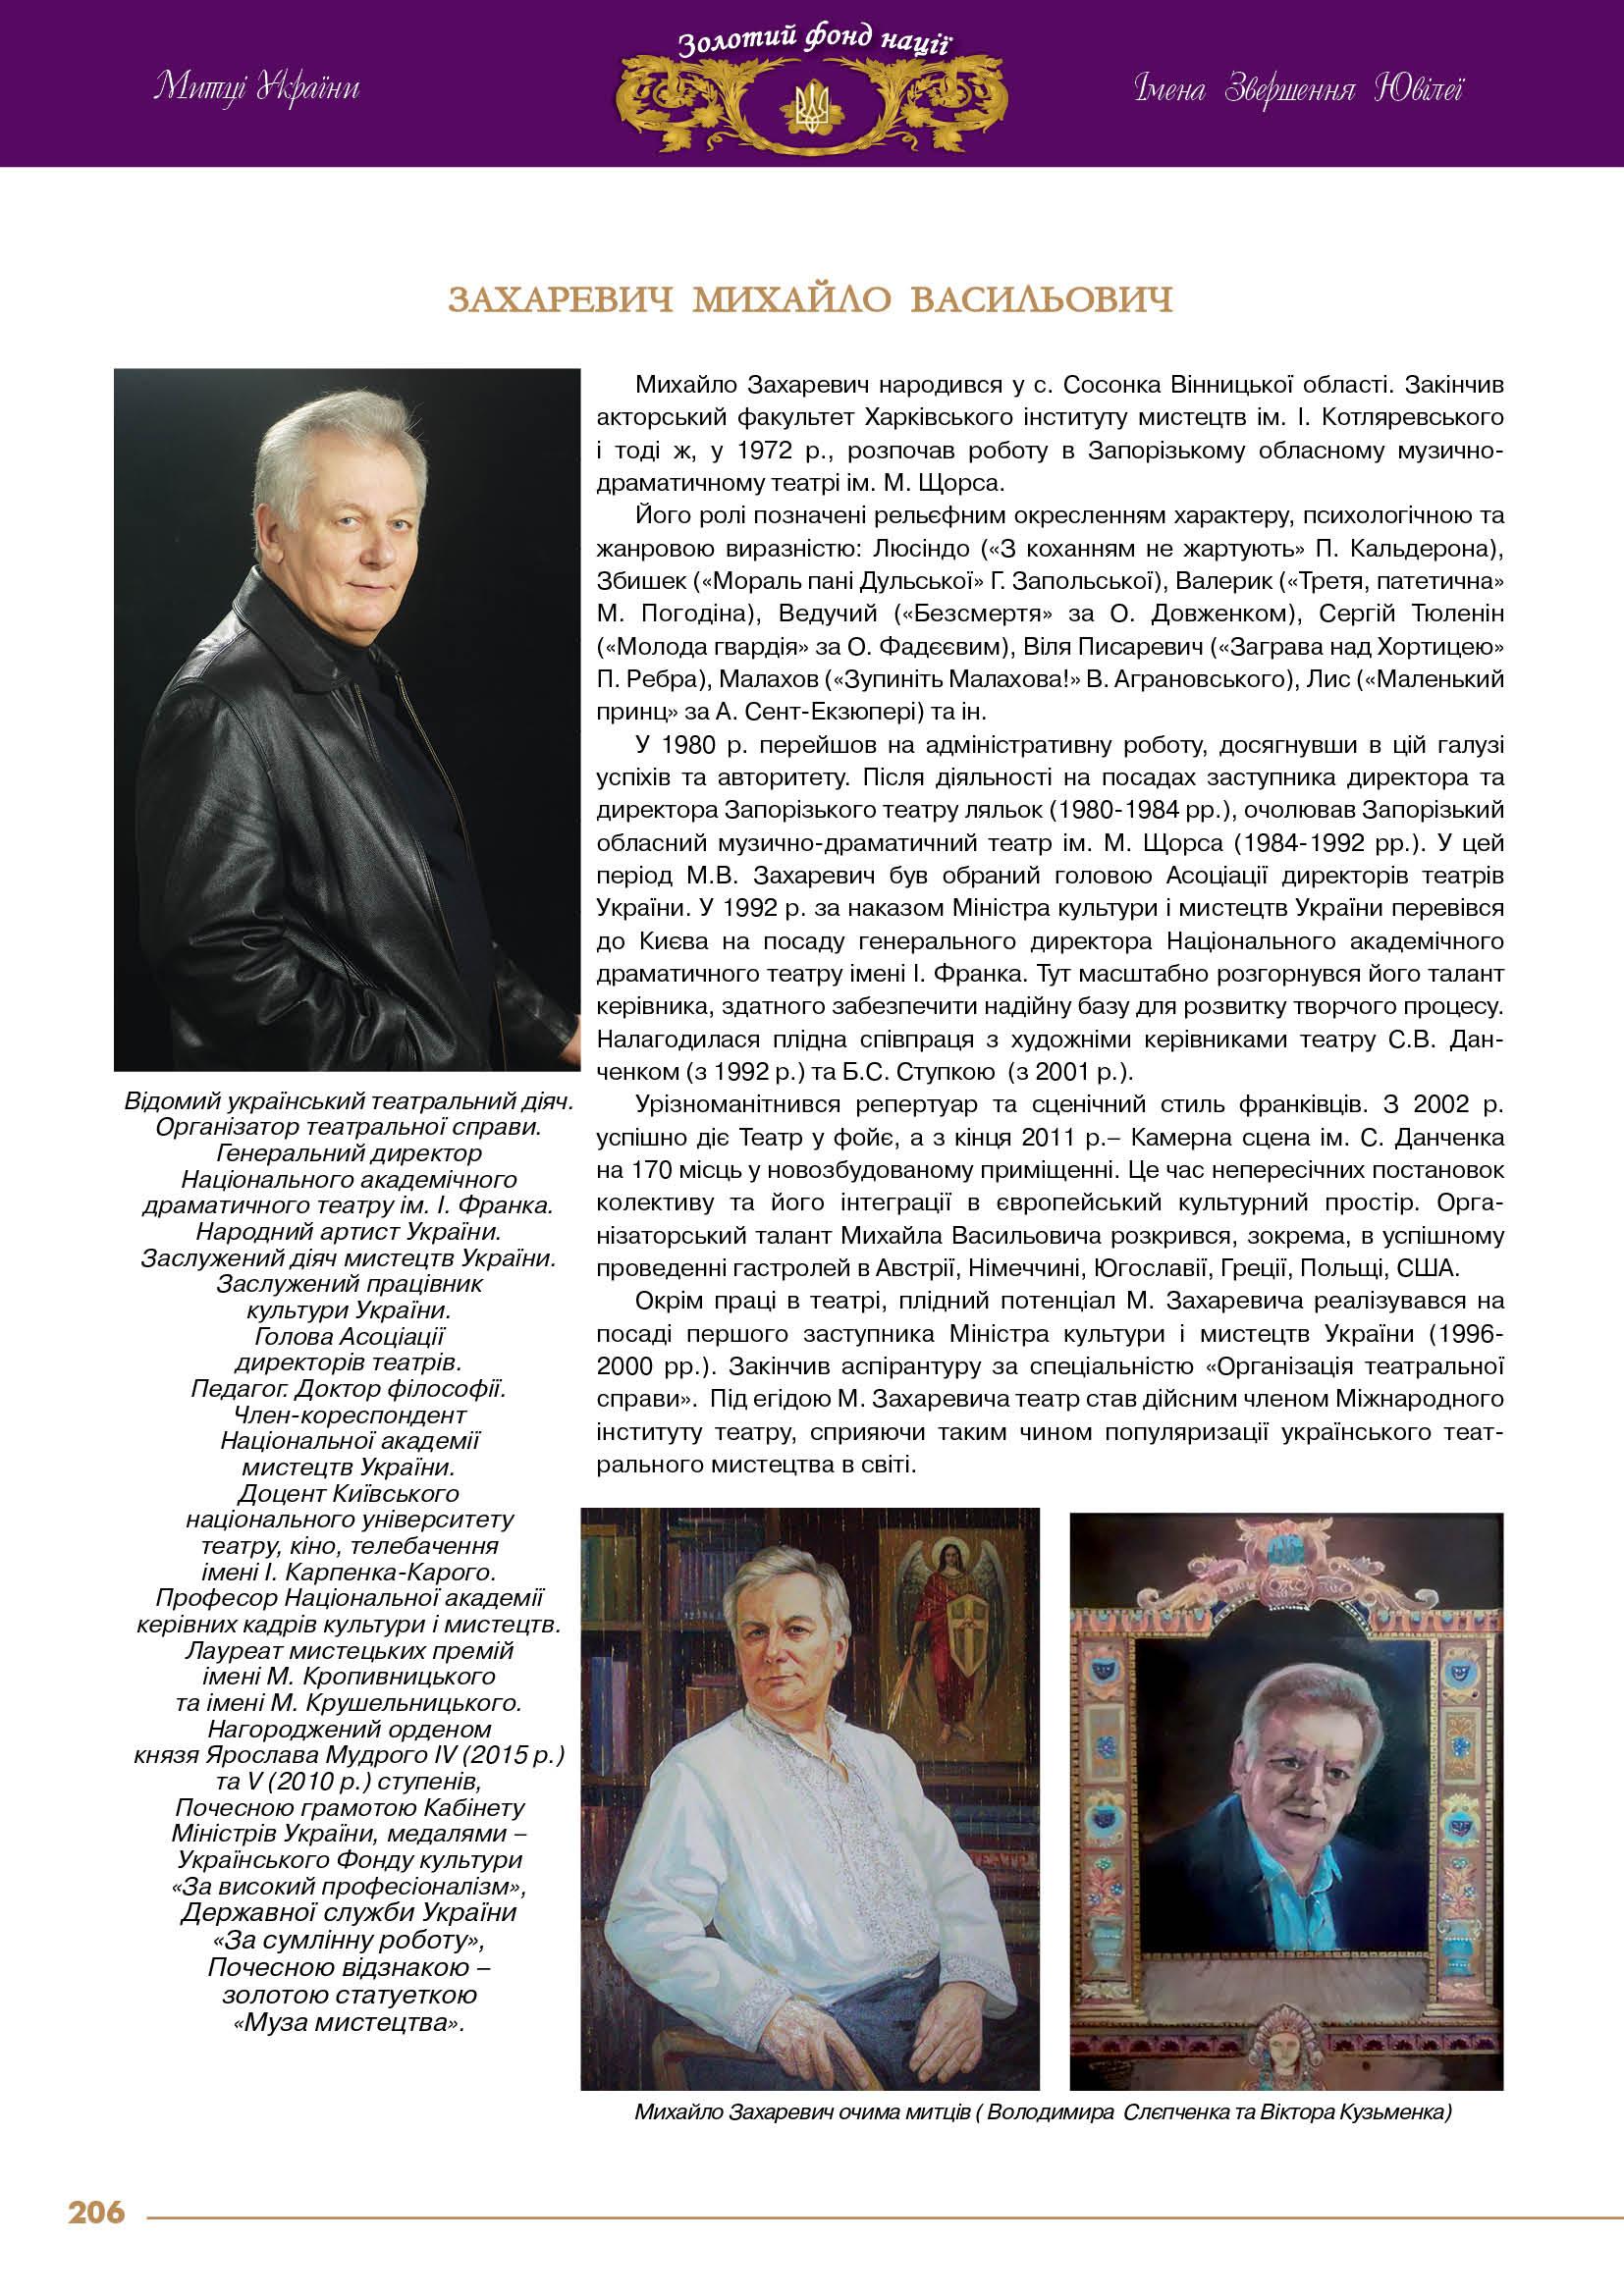 Захаревич  Михайло  Васильович